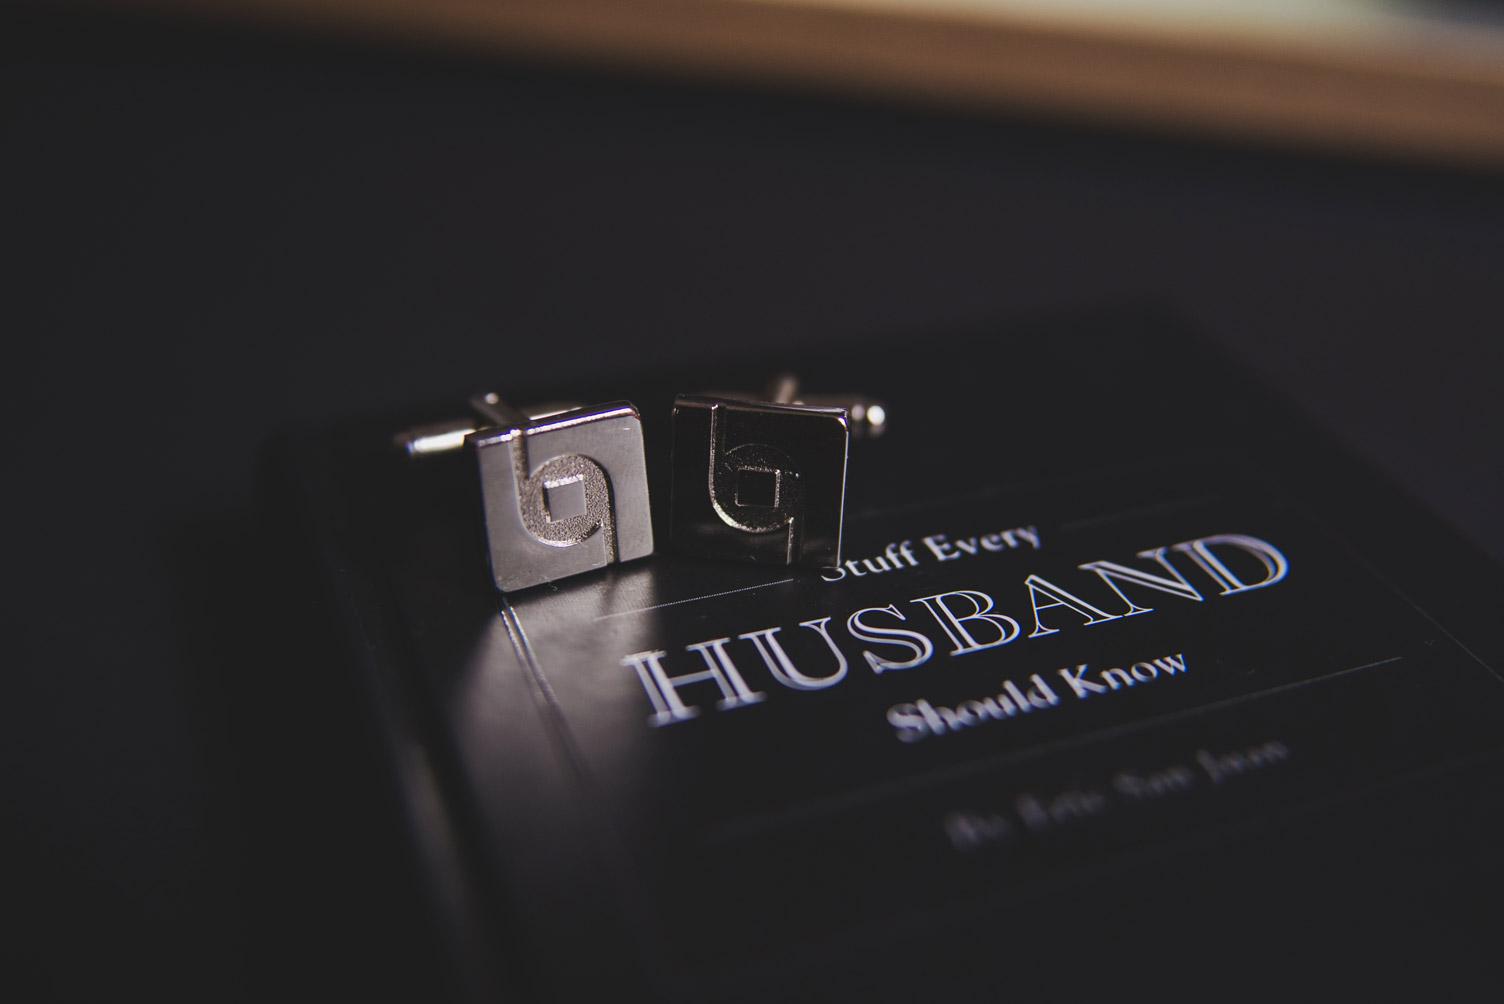 Groom's cufflinks wedding morning. Wedding photography meath.